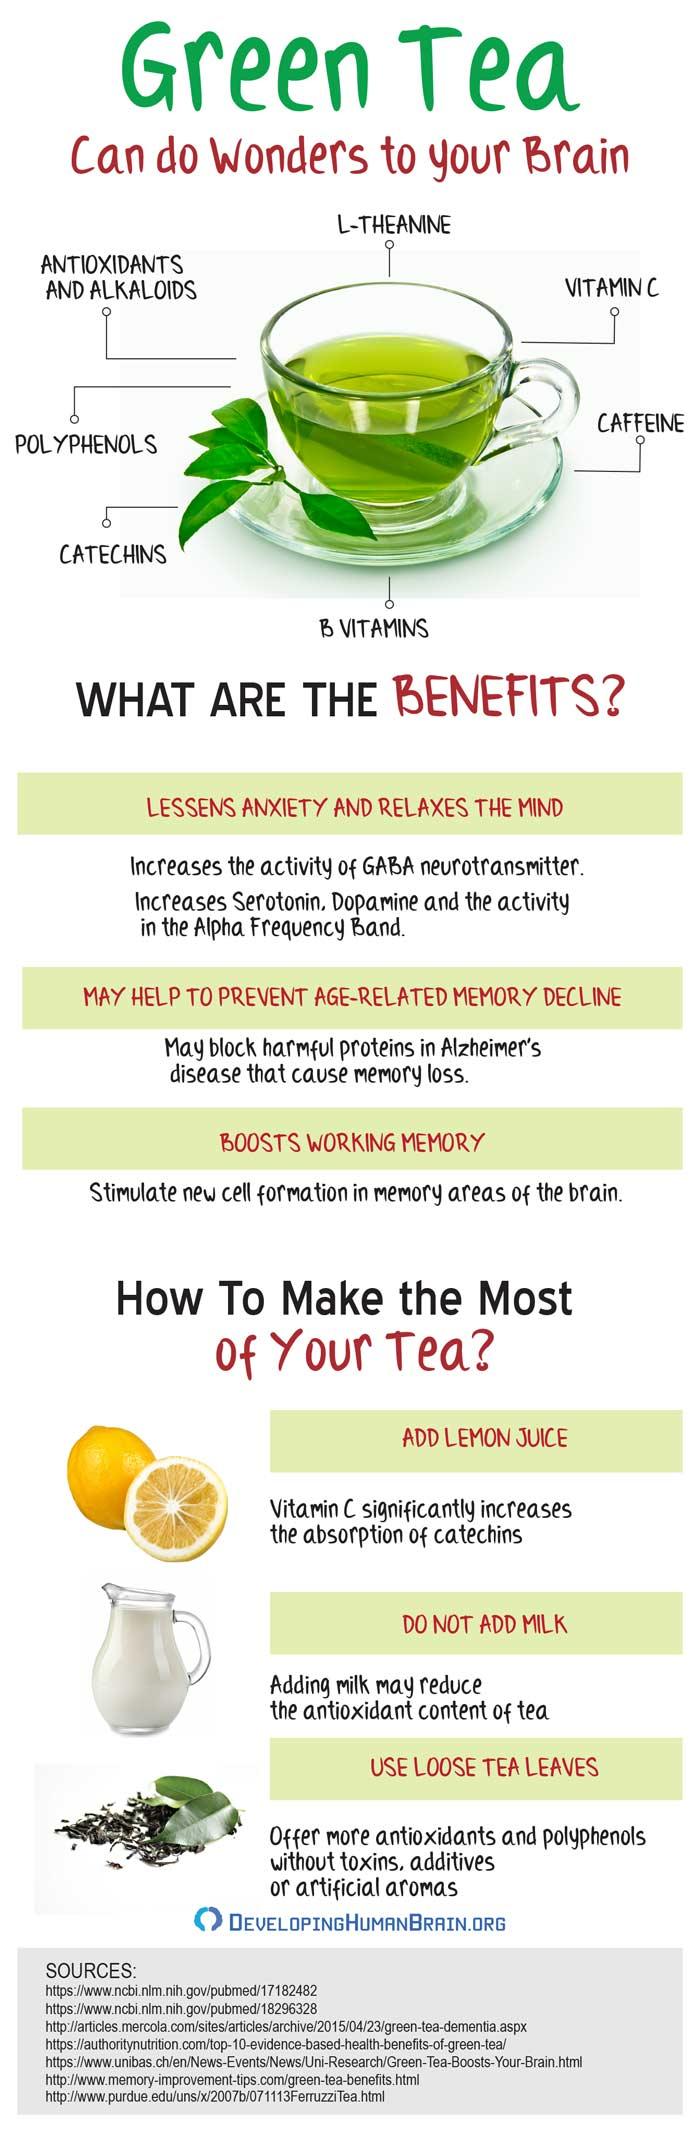 green tea brain benefits infographic